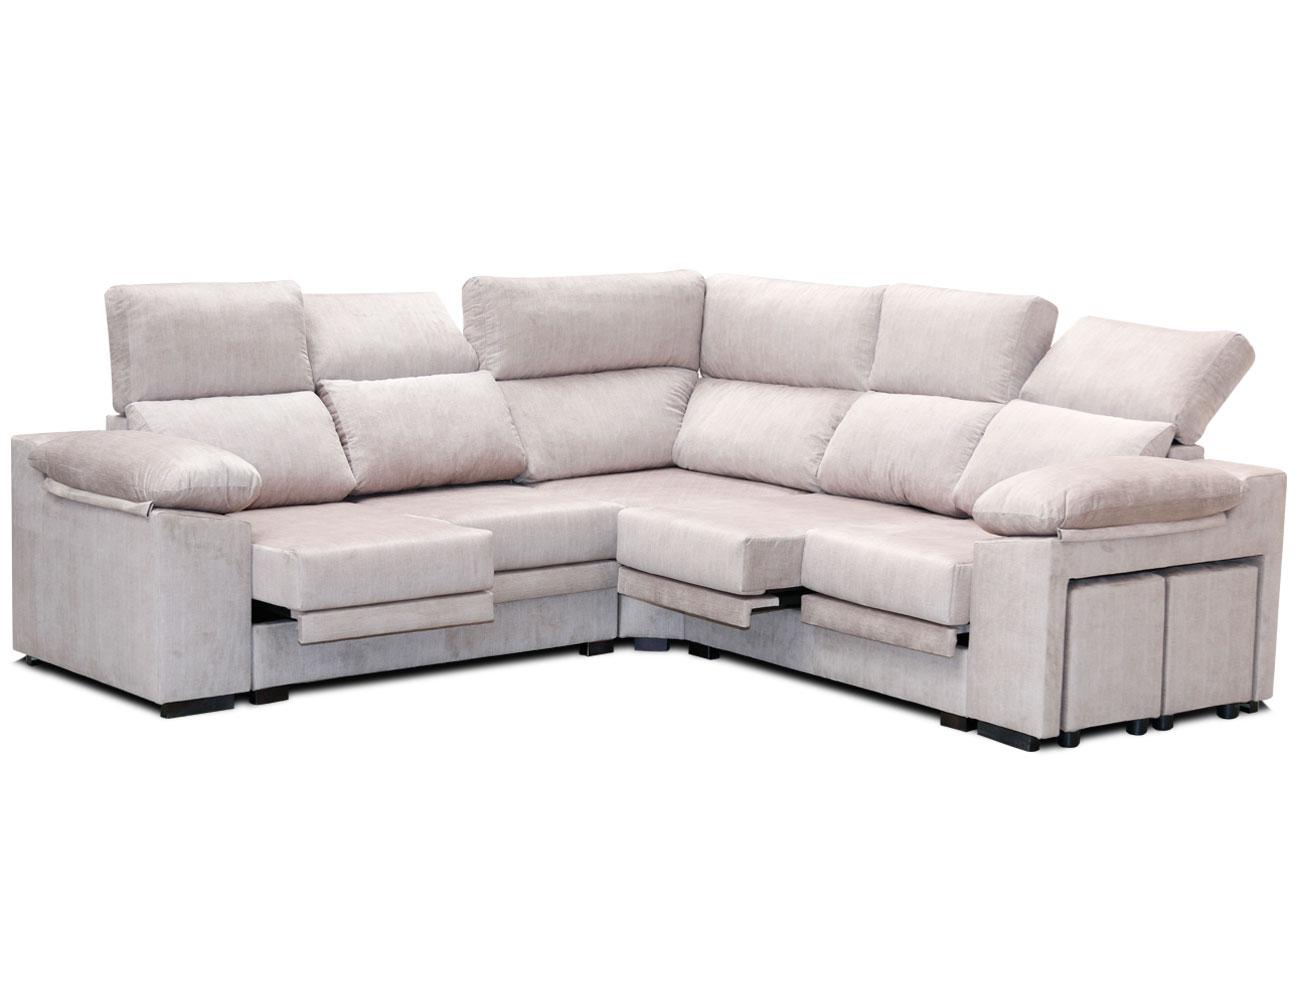 Sofa rincon rinconera beig pufs 1